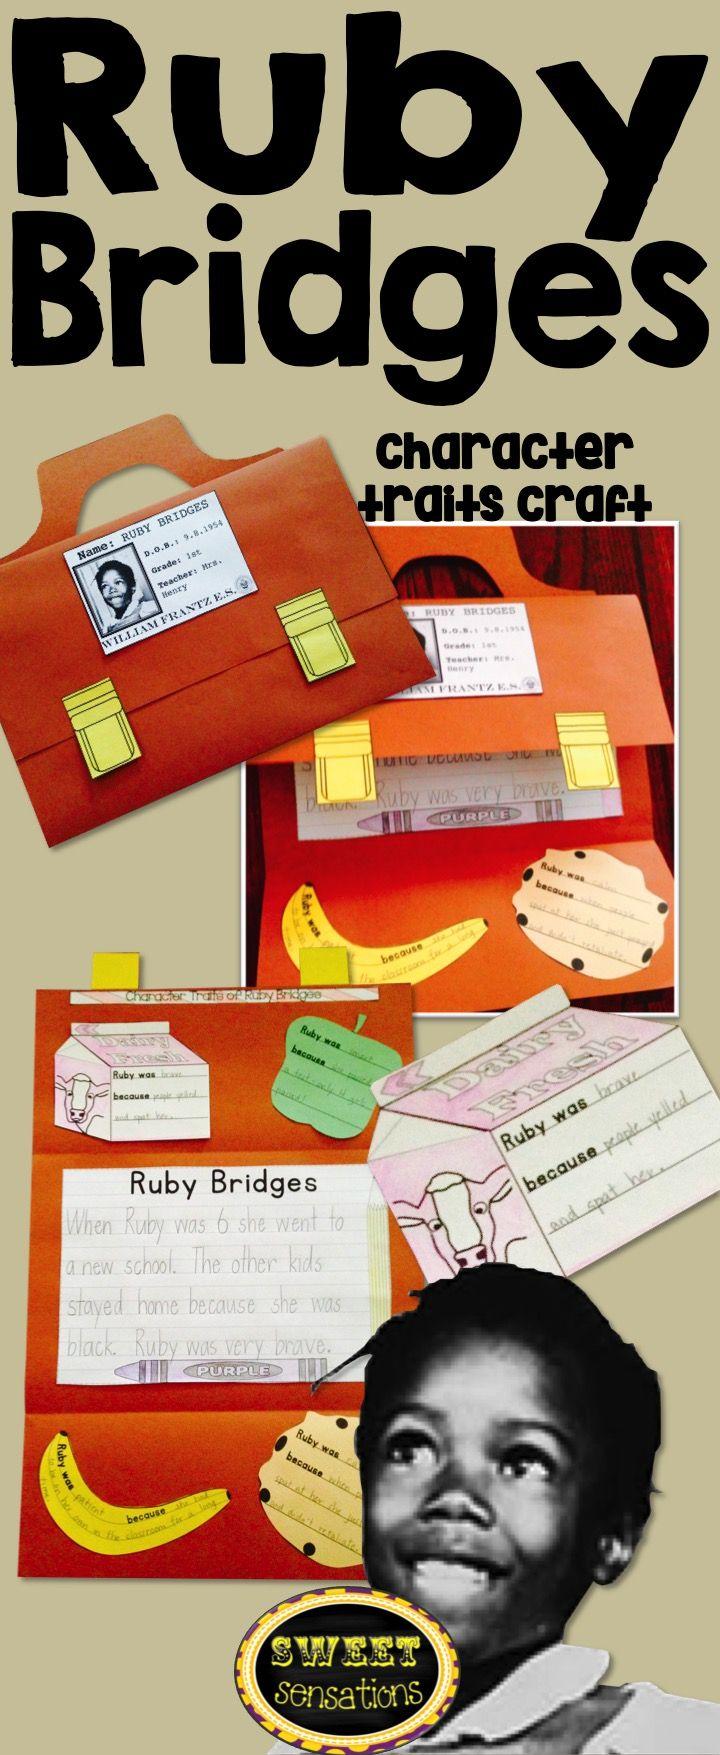 Ruby Bridges (Black History; character traits) | Kind